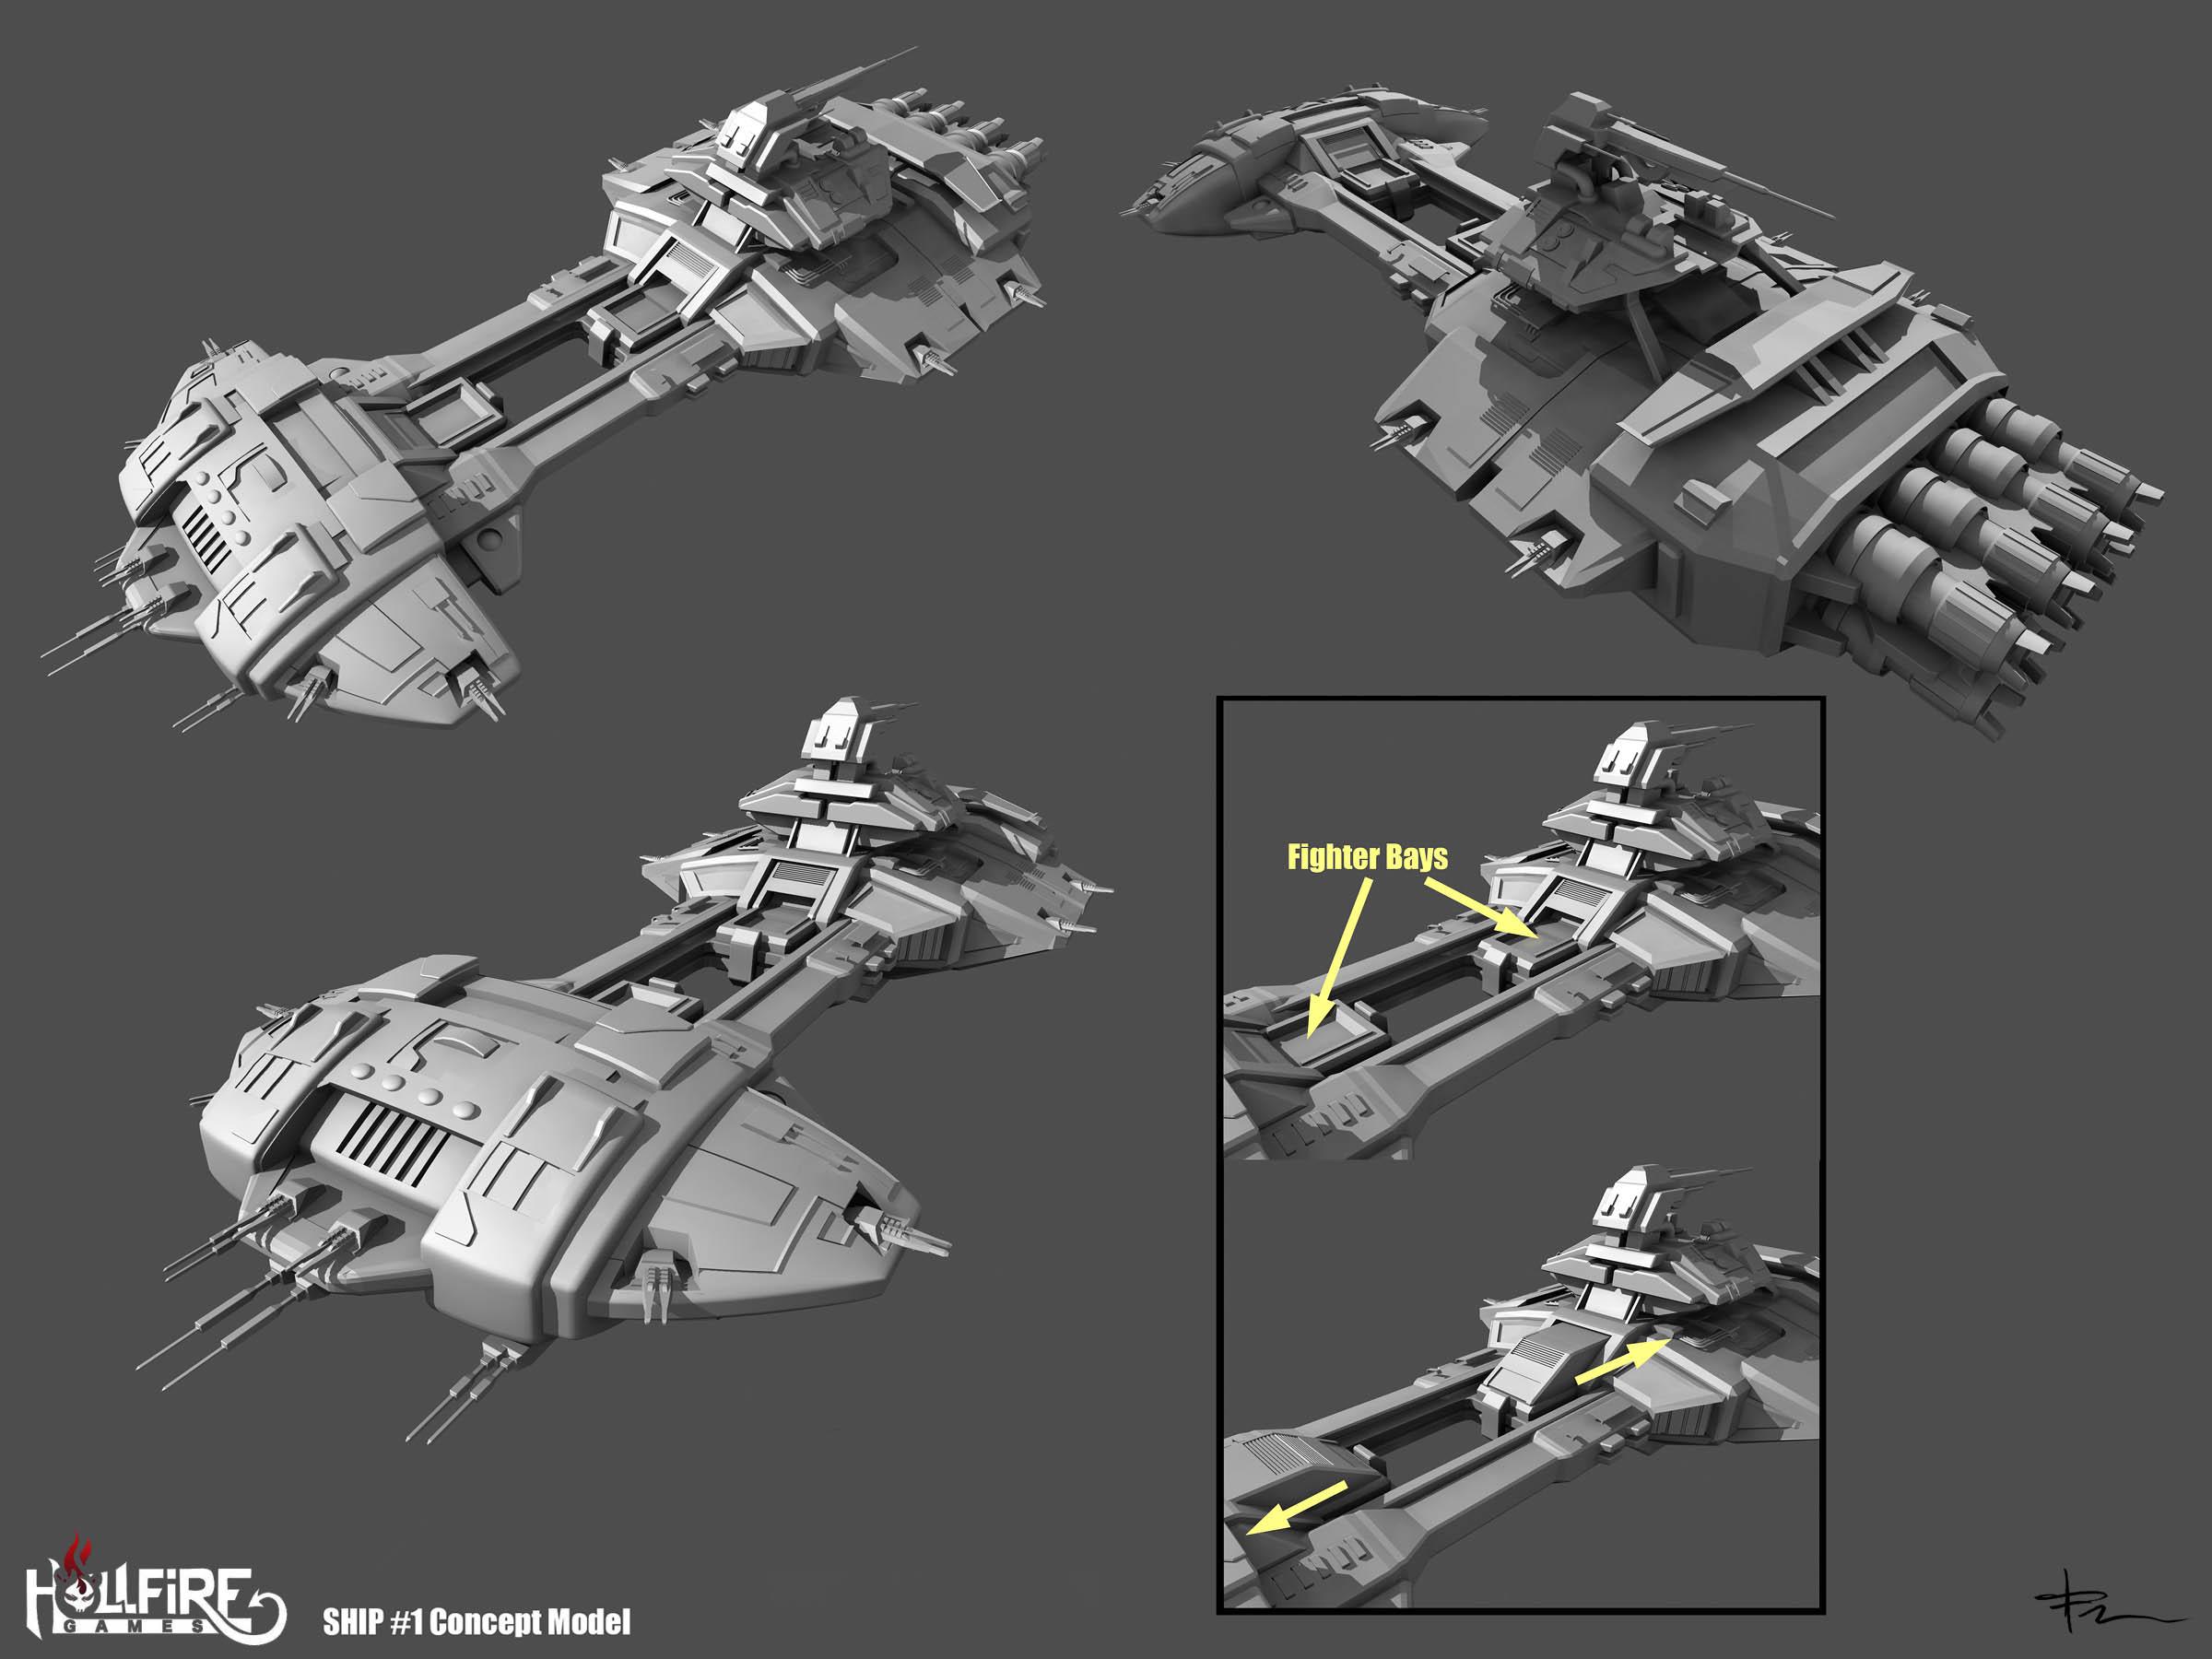 TJFrame-Art_HellfireGames_Ship1ConceptModel.jpg